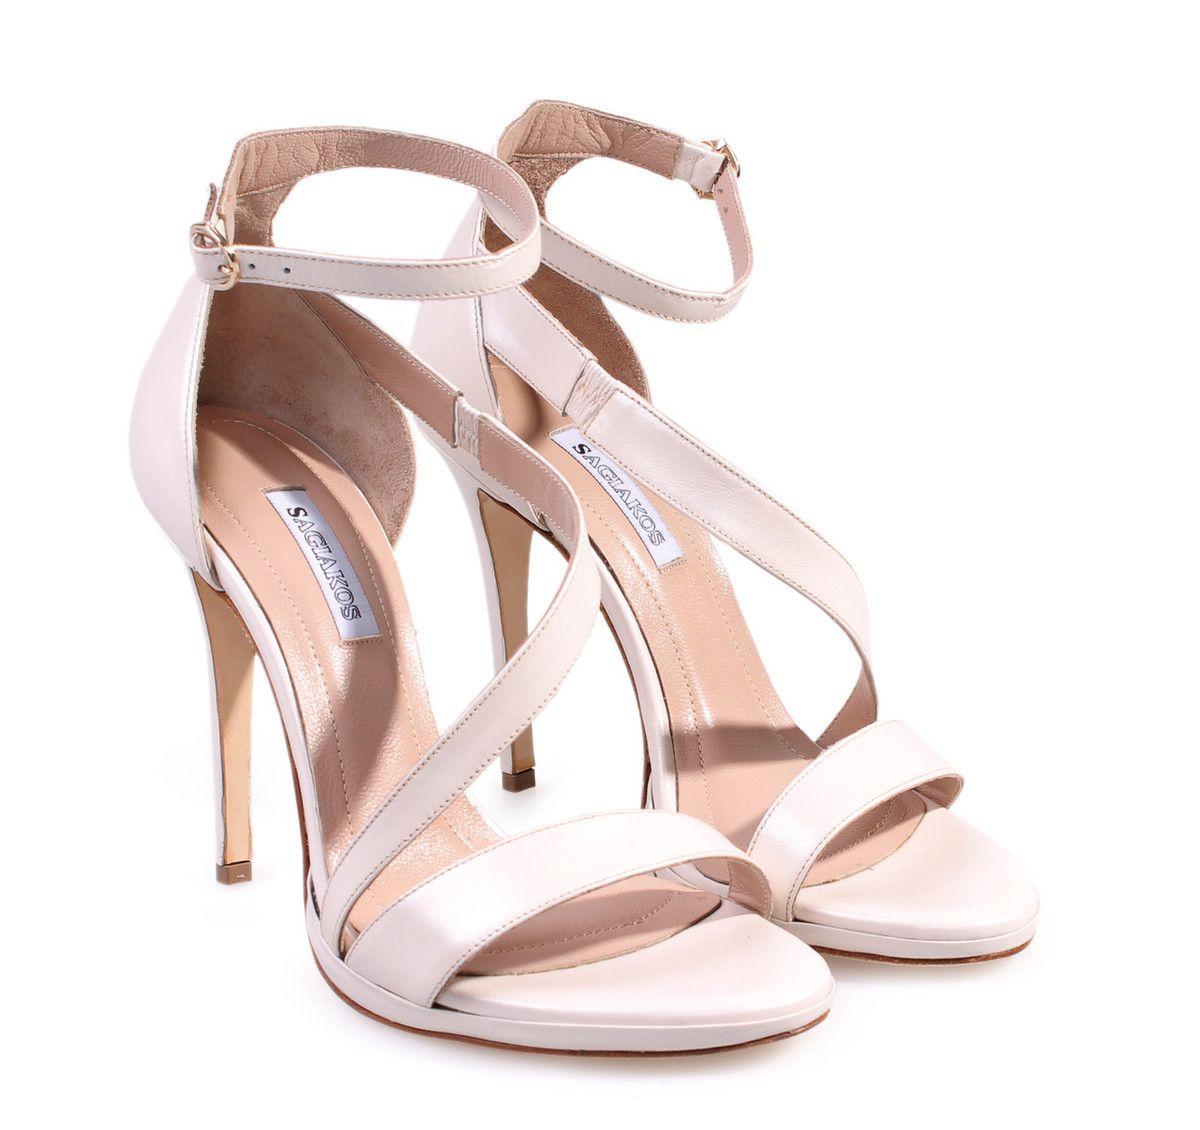 8c4e2405663 SAGIAKOS Ivory Leather Bridal High-heeled Sandals. Γυναικεία ιβουάρ  δερμάτινα ψηλοτάκουνα νυφικά πέδιλα.